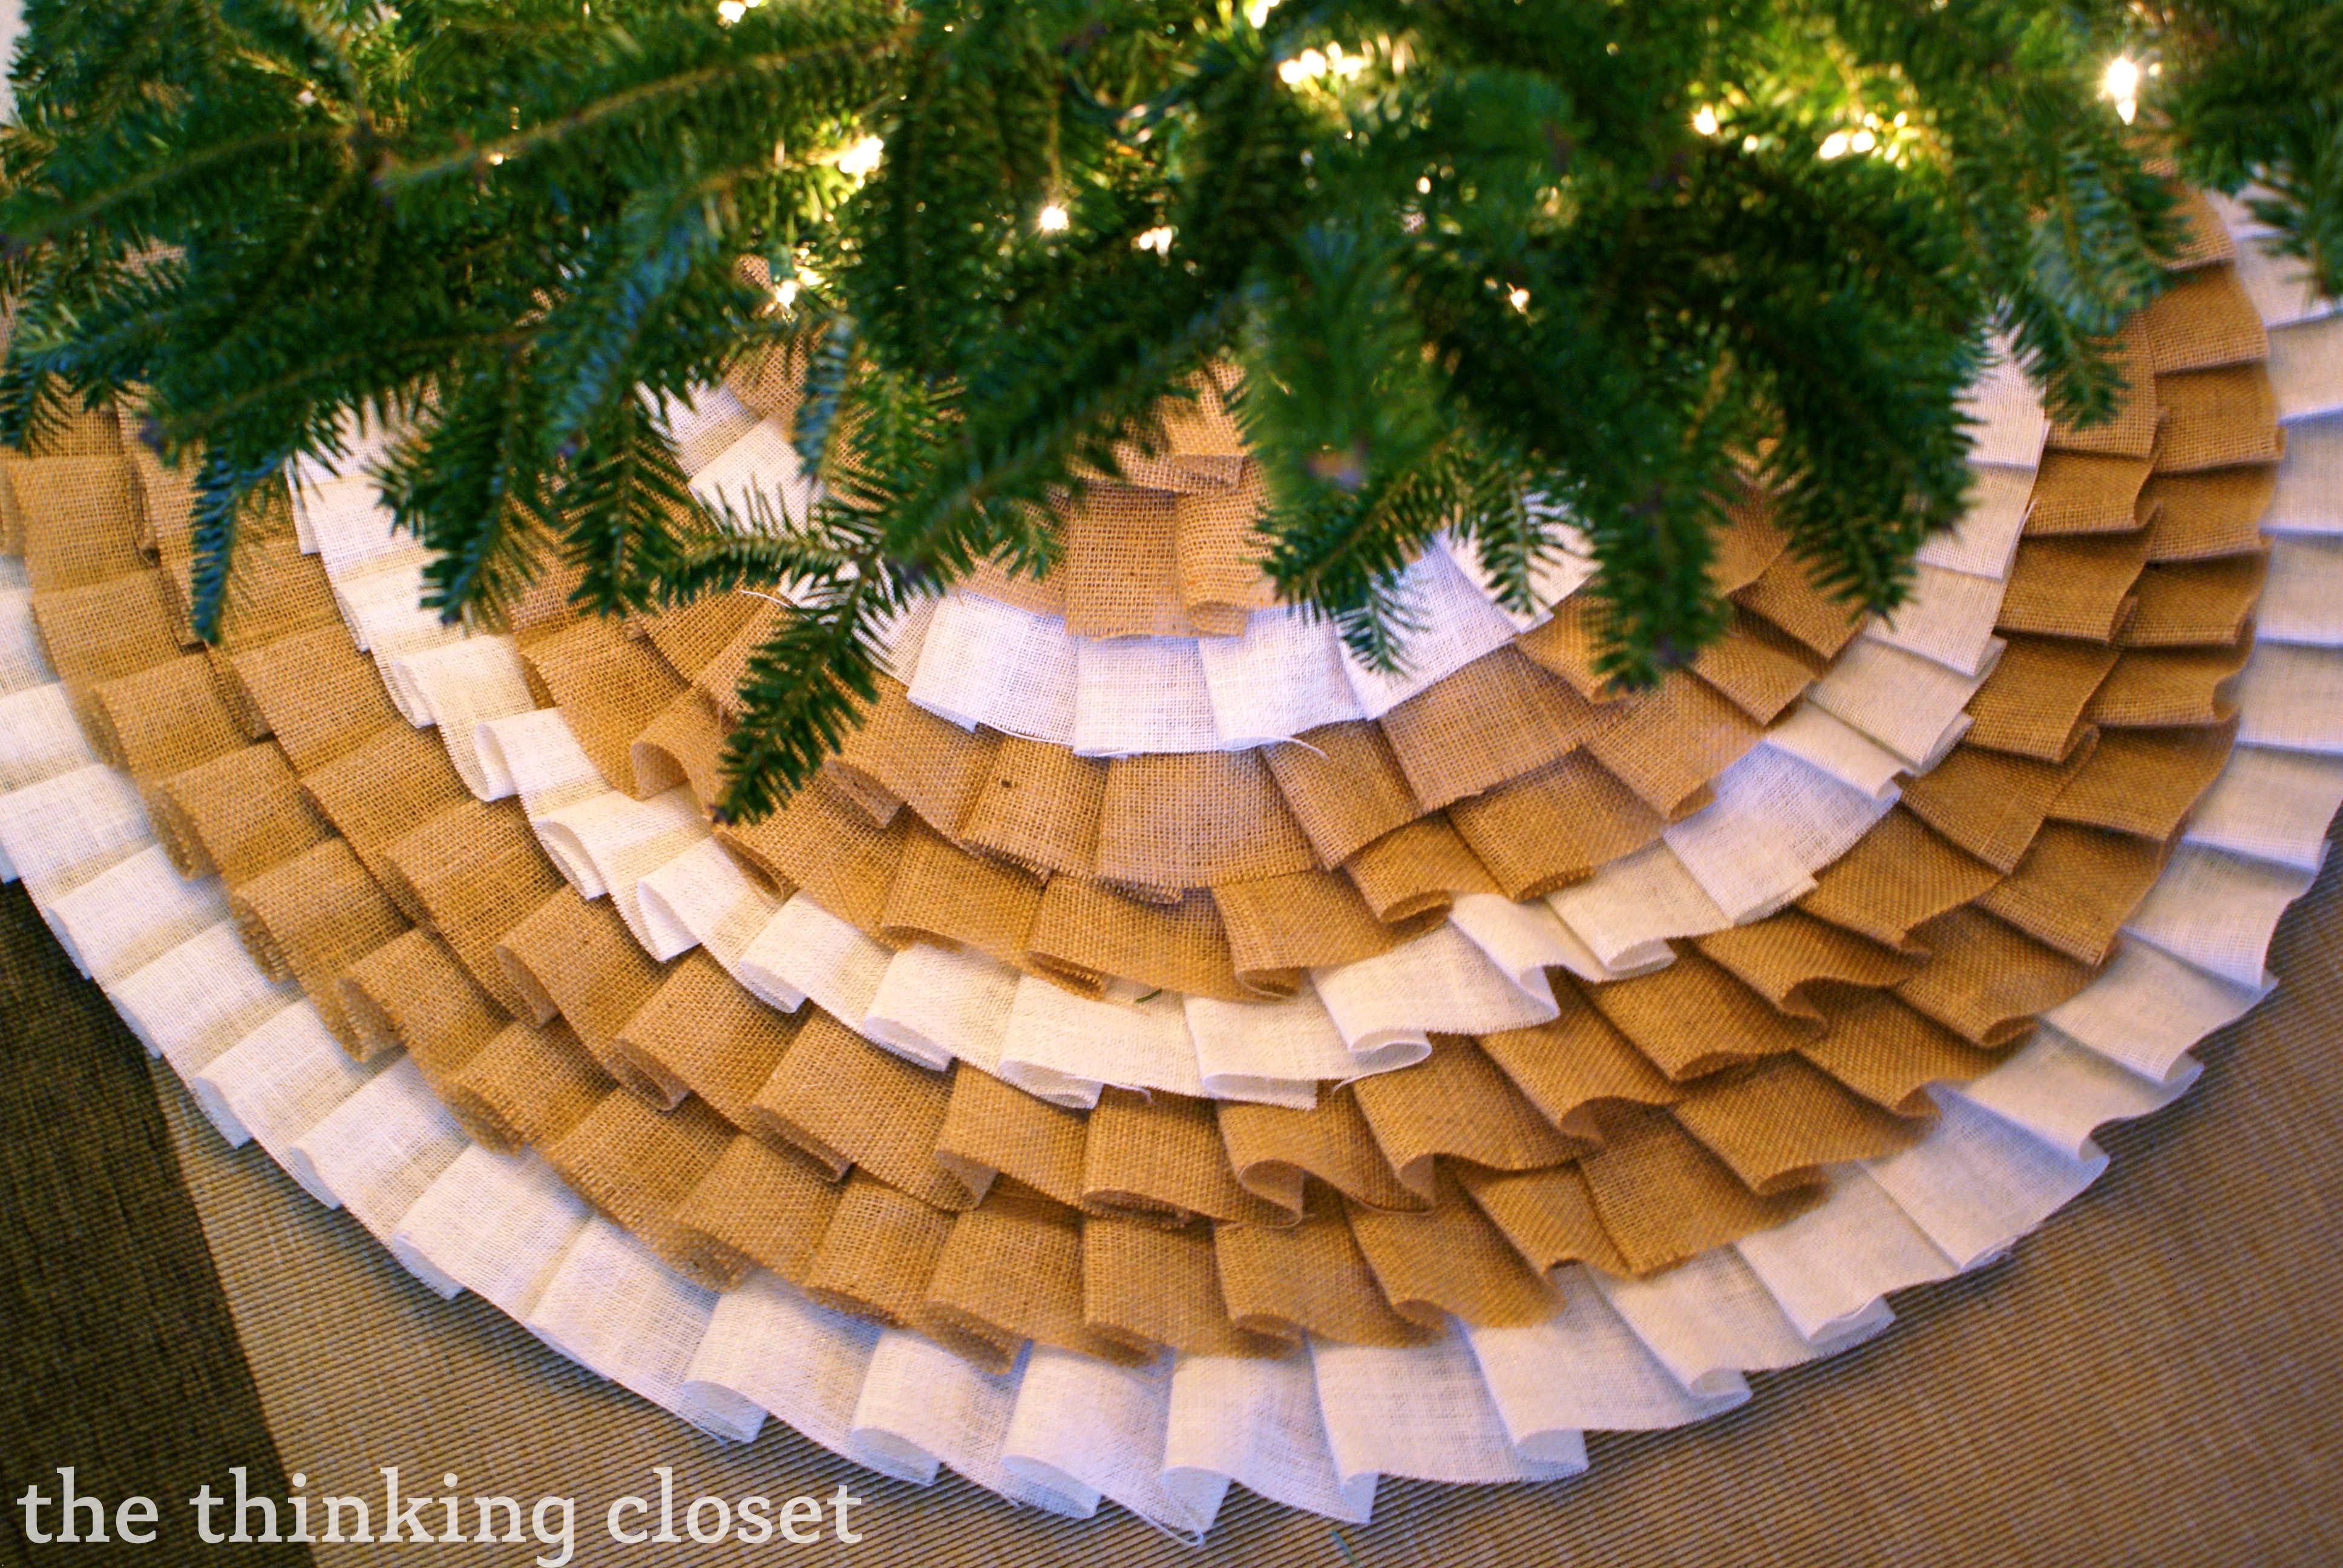 D.I.Y. No-Sew Ruffle Christmas Tree Skirt by The Thinking Closet